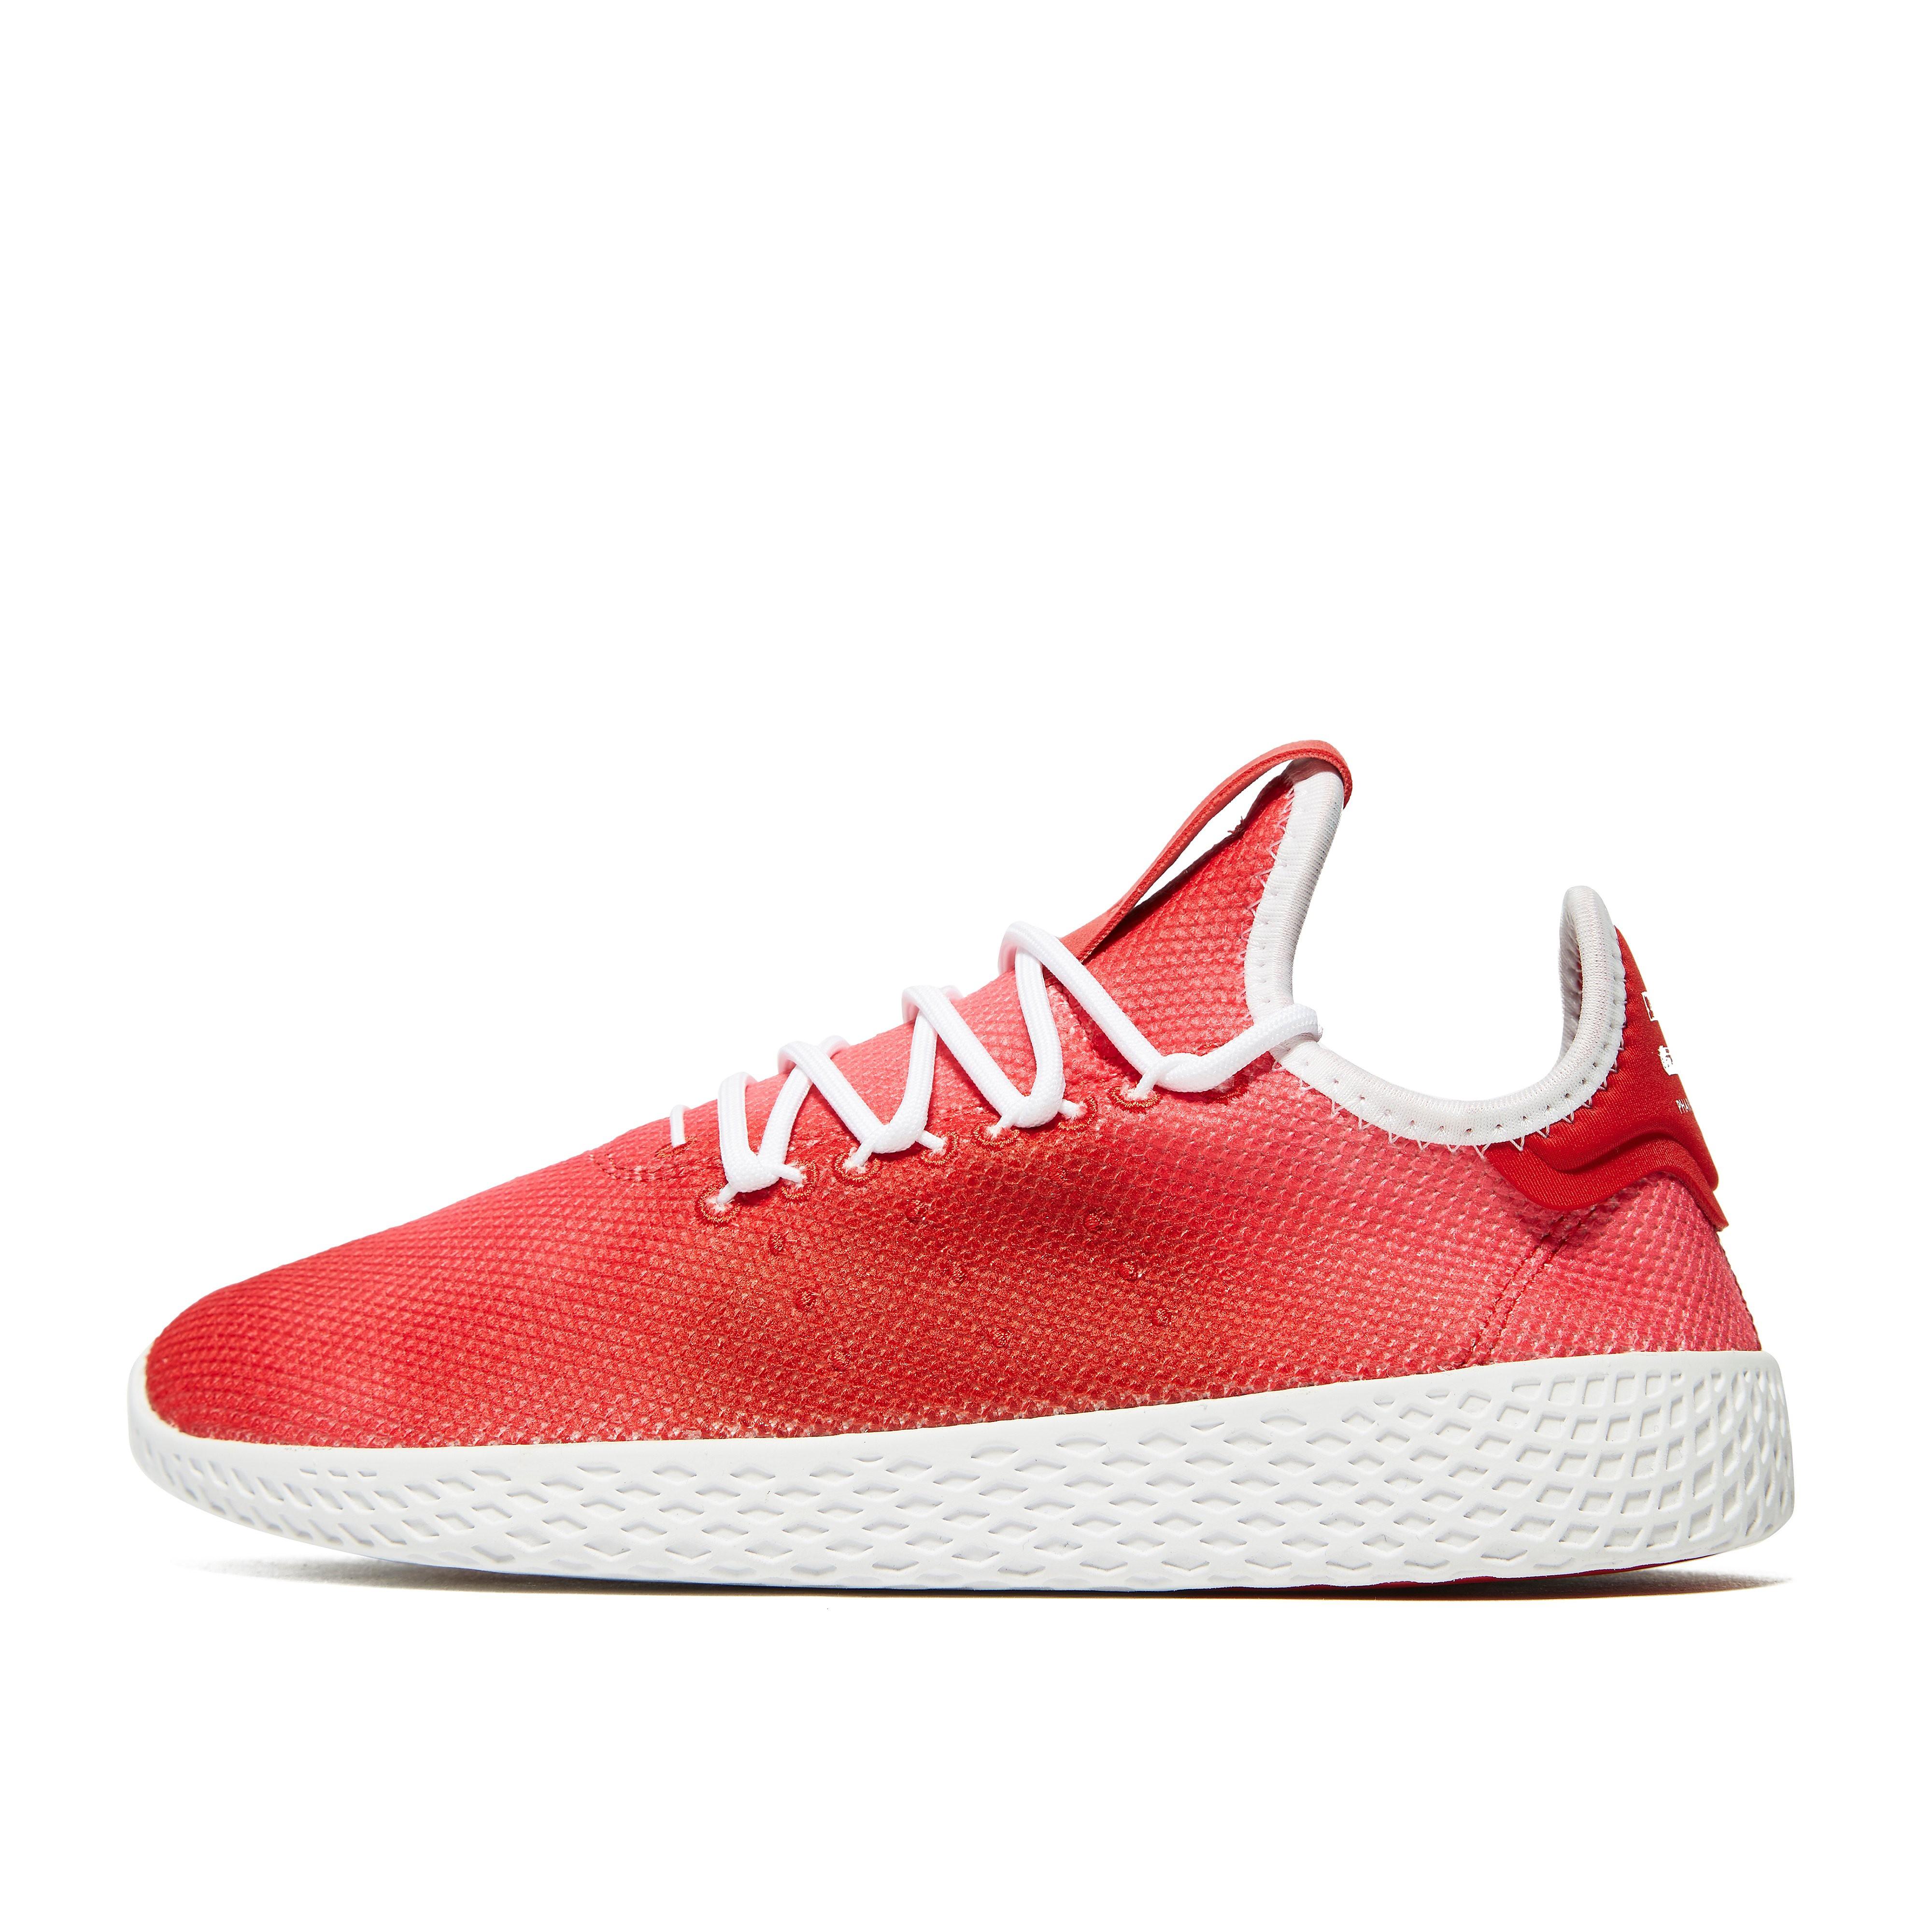 adidas Originals Pharrell Williams Tennis Hu Junior